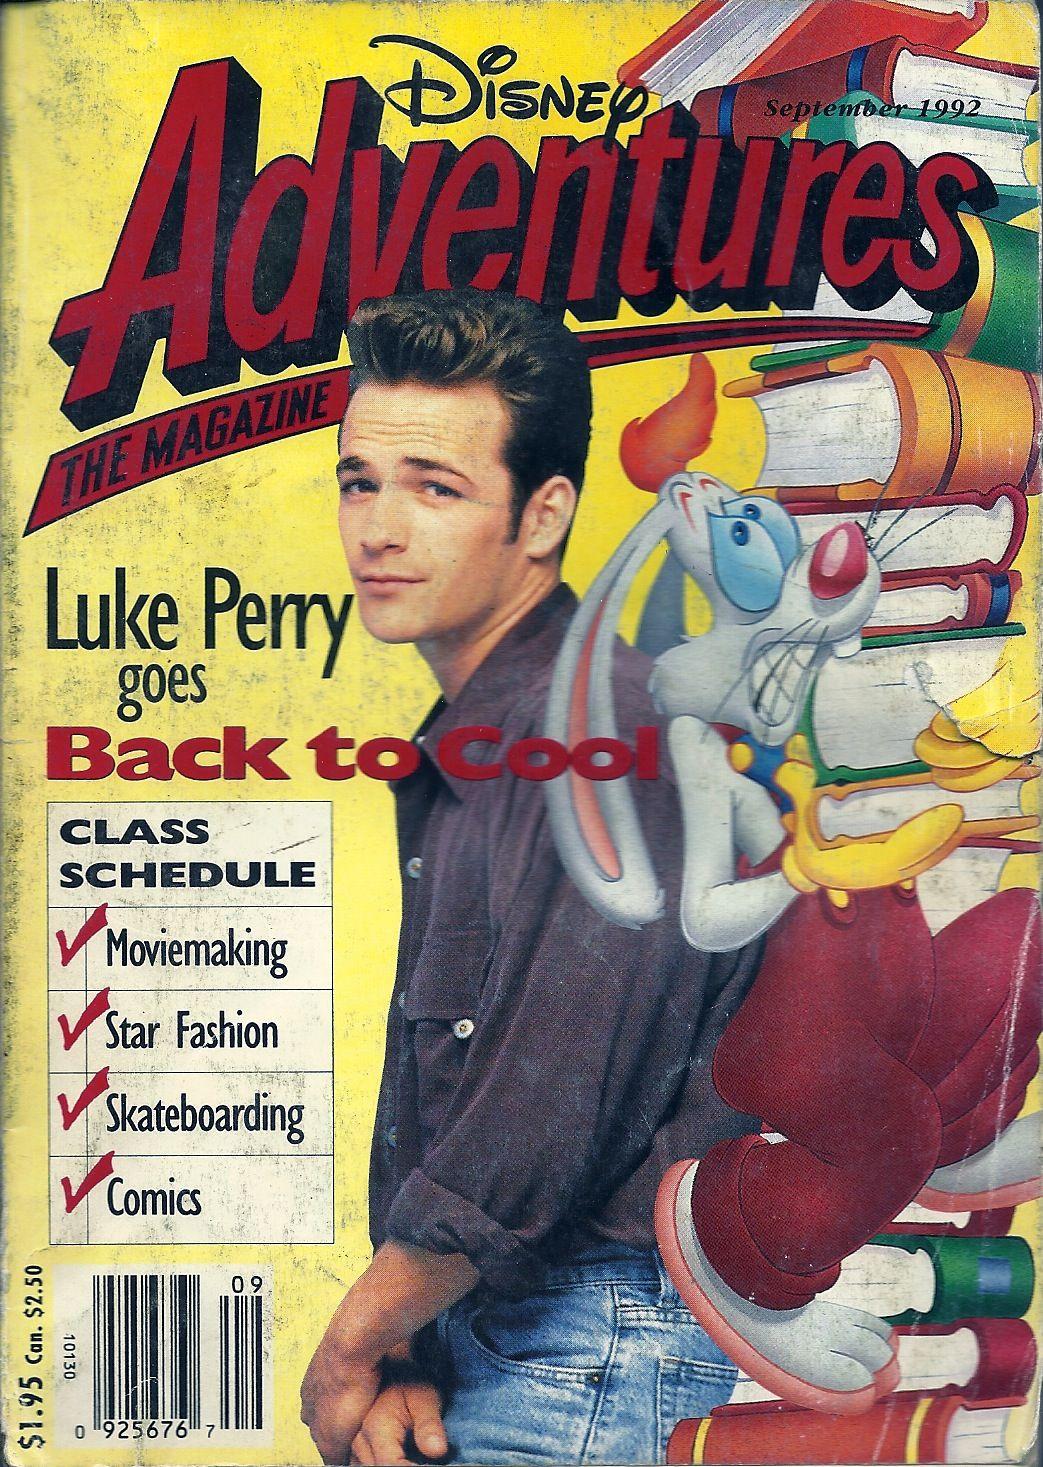 Disney adventures september 1992 adventure magazine